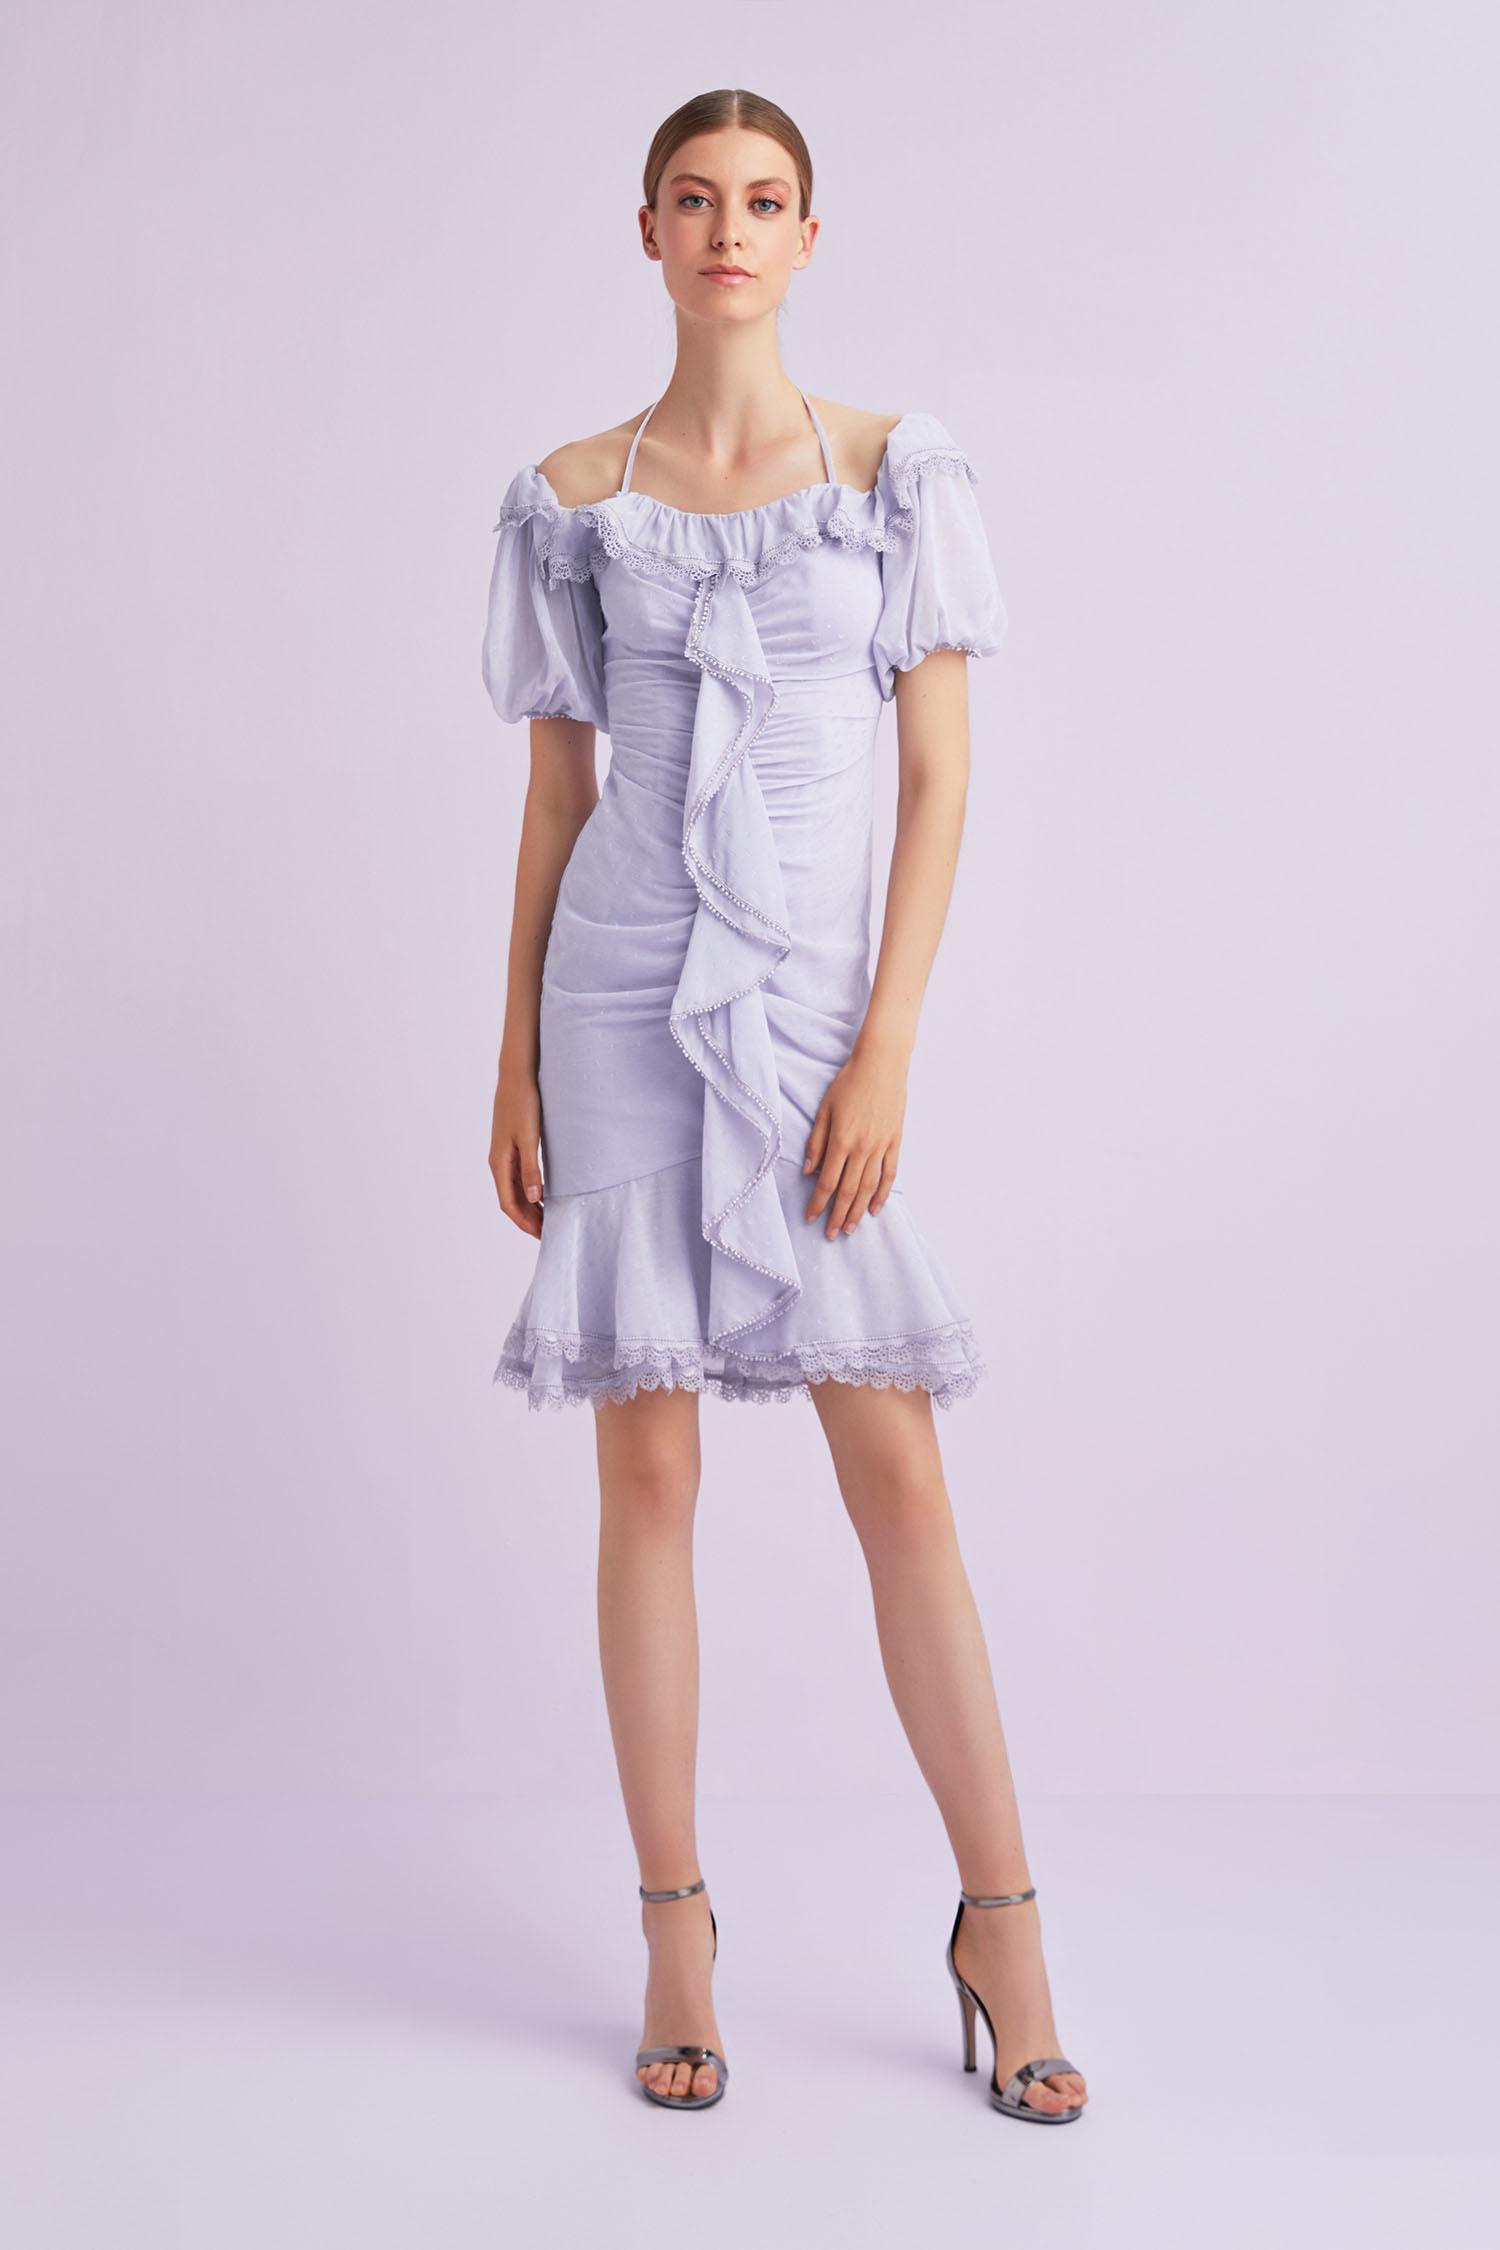 Lila Kısa Balon Kol Fırfırlı Mini Şifon Elbise - Thumbnail